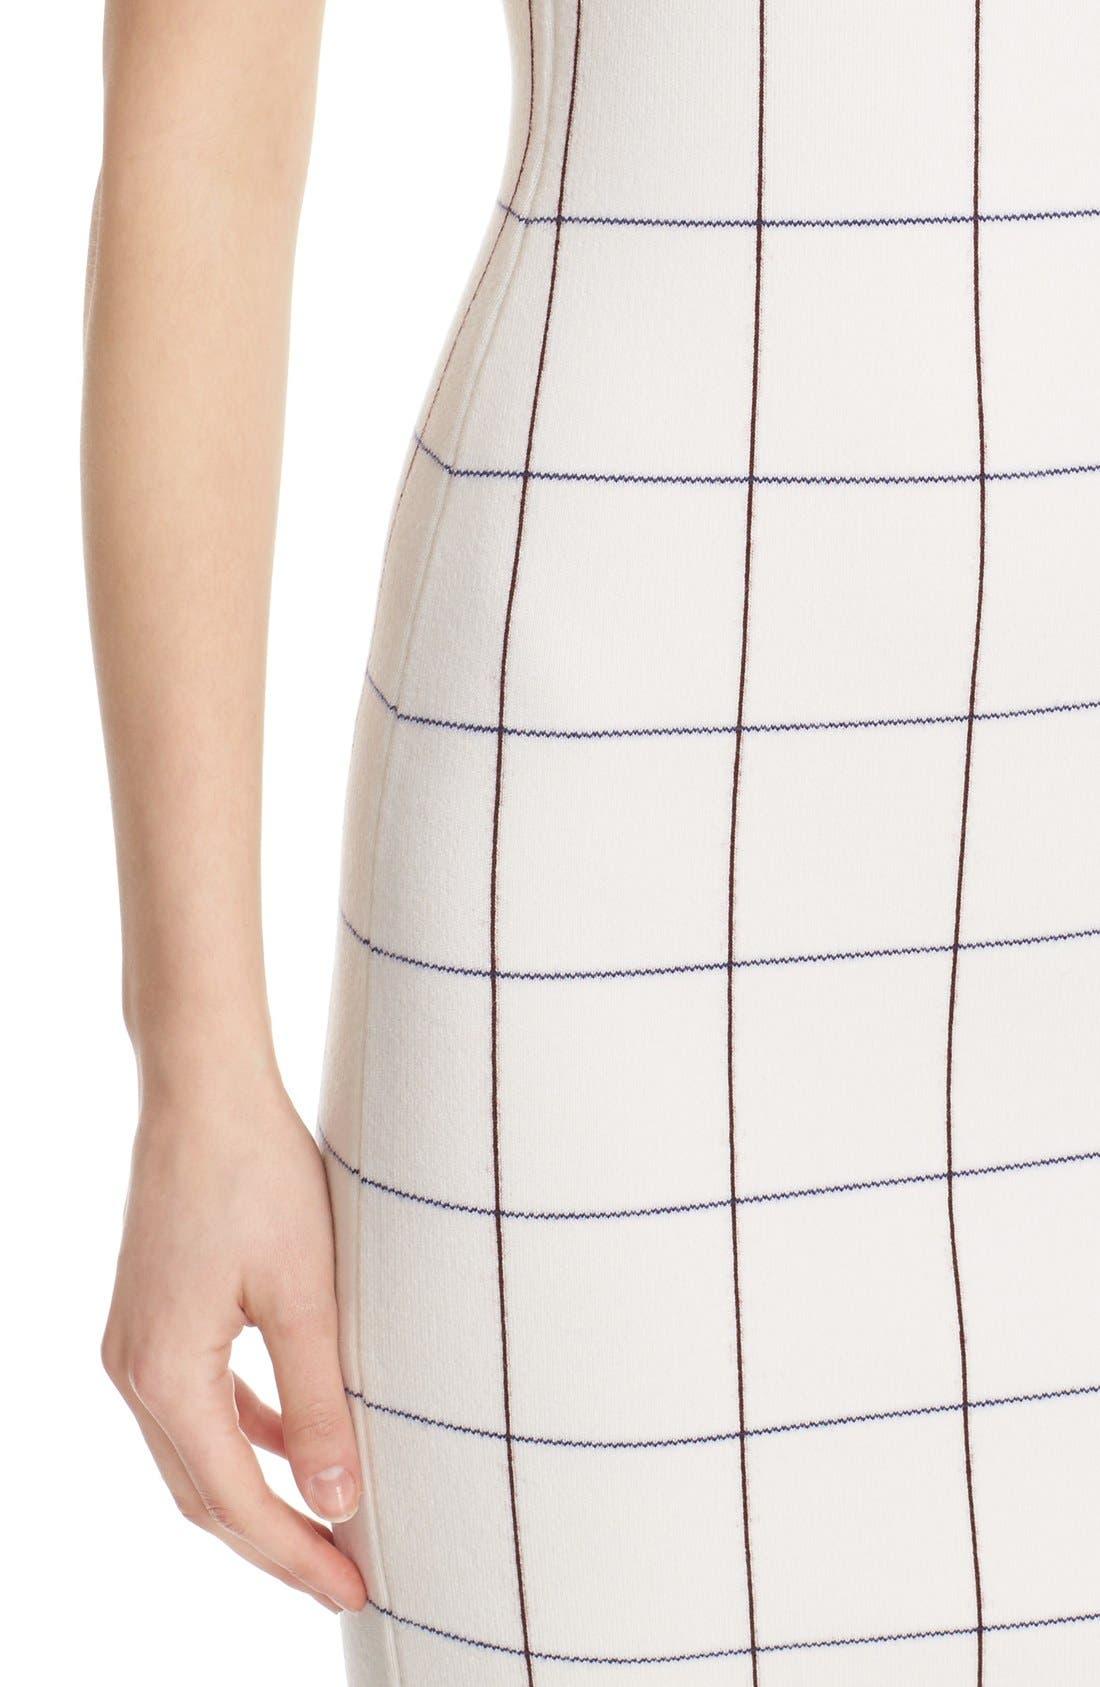 Victoria Beckham Intarsia Check Sheath Dress,                             Alternate thumbnail 6, color,                             100